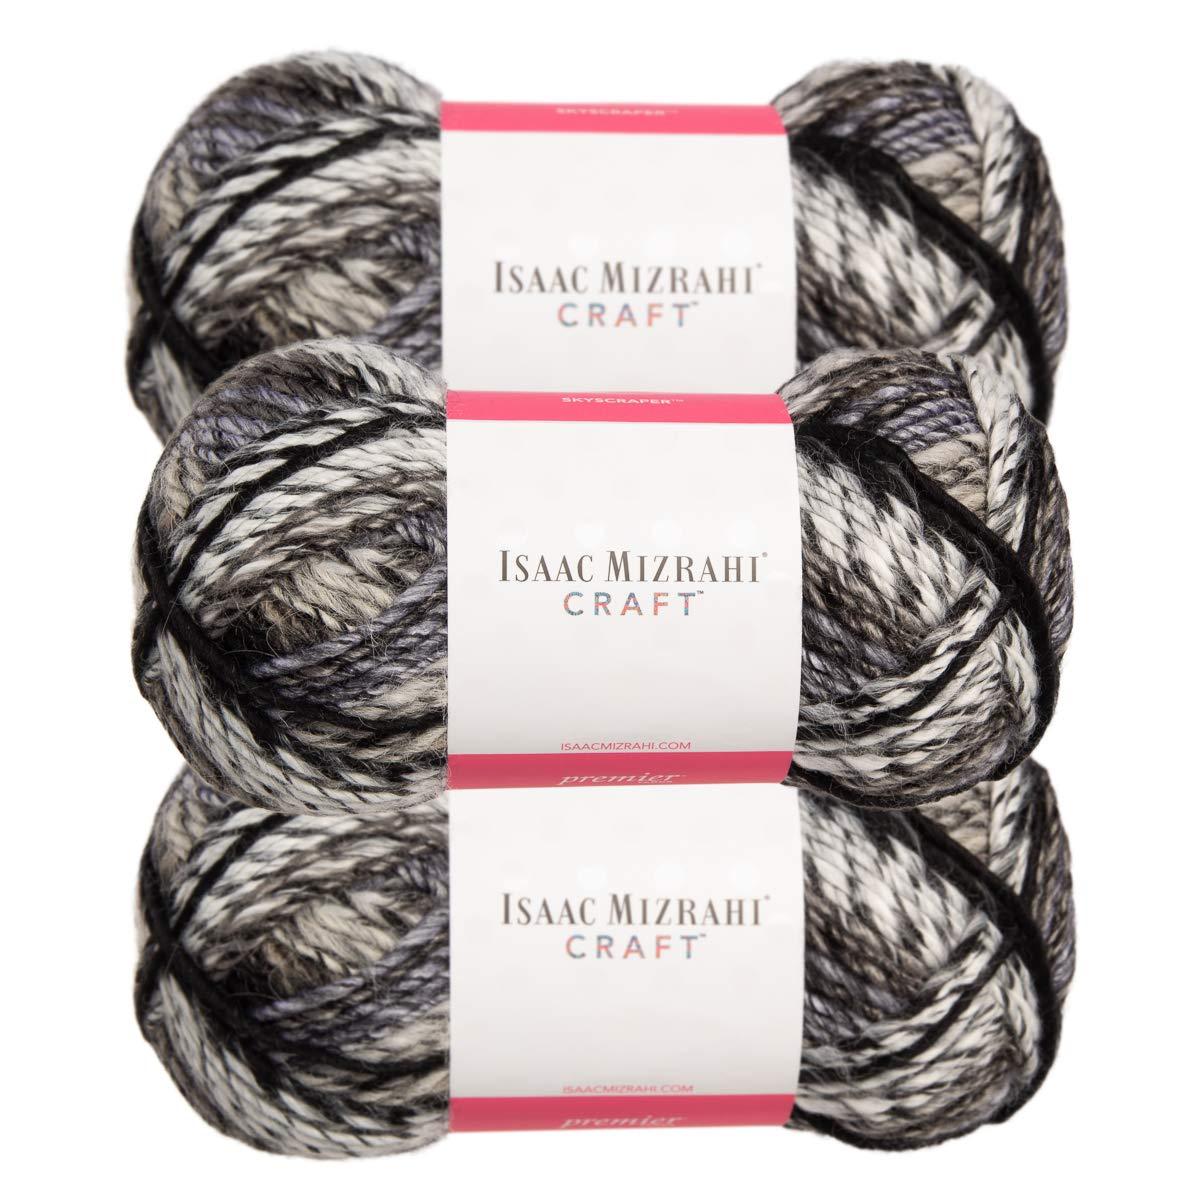 Premier Yarns (3 Pack Isaac Mizrahi NY Skyscraper Acrylic Soft Empire White Black Gray Yarn for Knitting Crocheting #5 Bulky